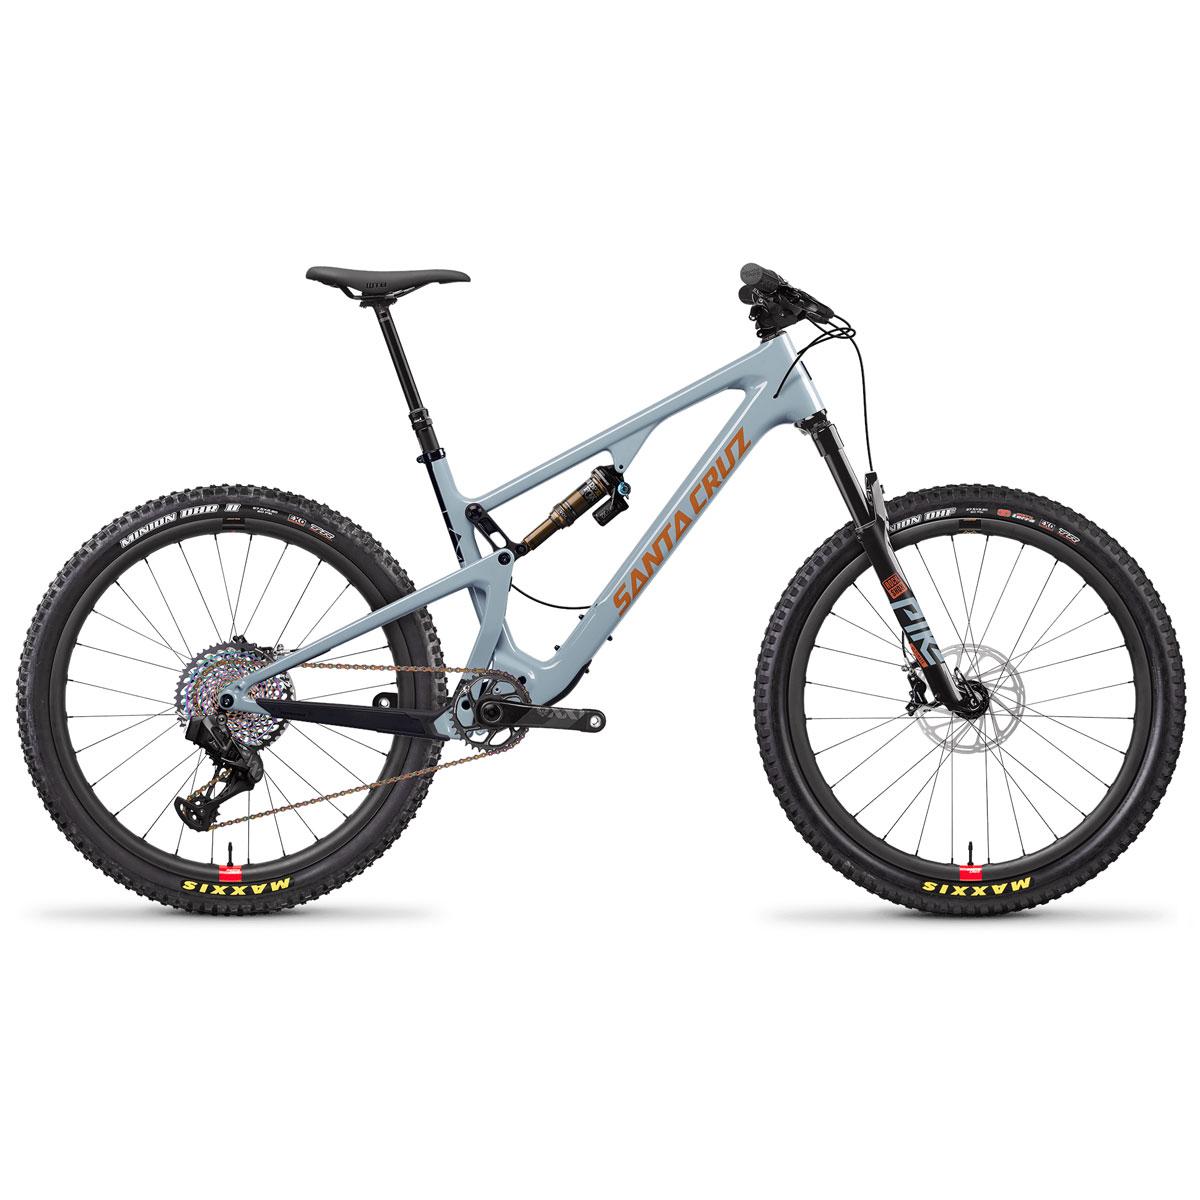 MTB Santa Cruz 5010 XX1 AXS Reserve Carbon CC 27.5 (Carbon CC/Eagle XX1 AXS elektronisch/12,38kg) - 2020 (M,L)